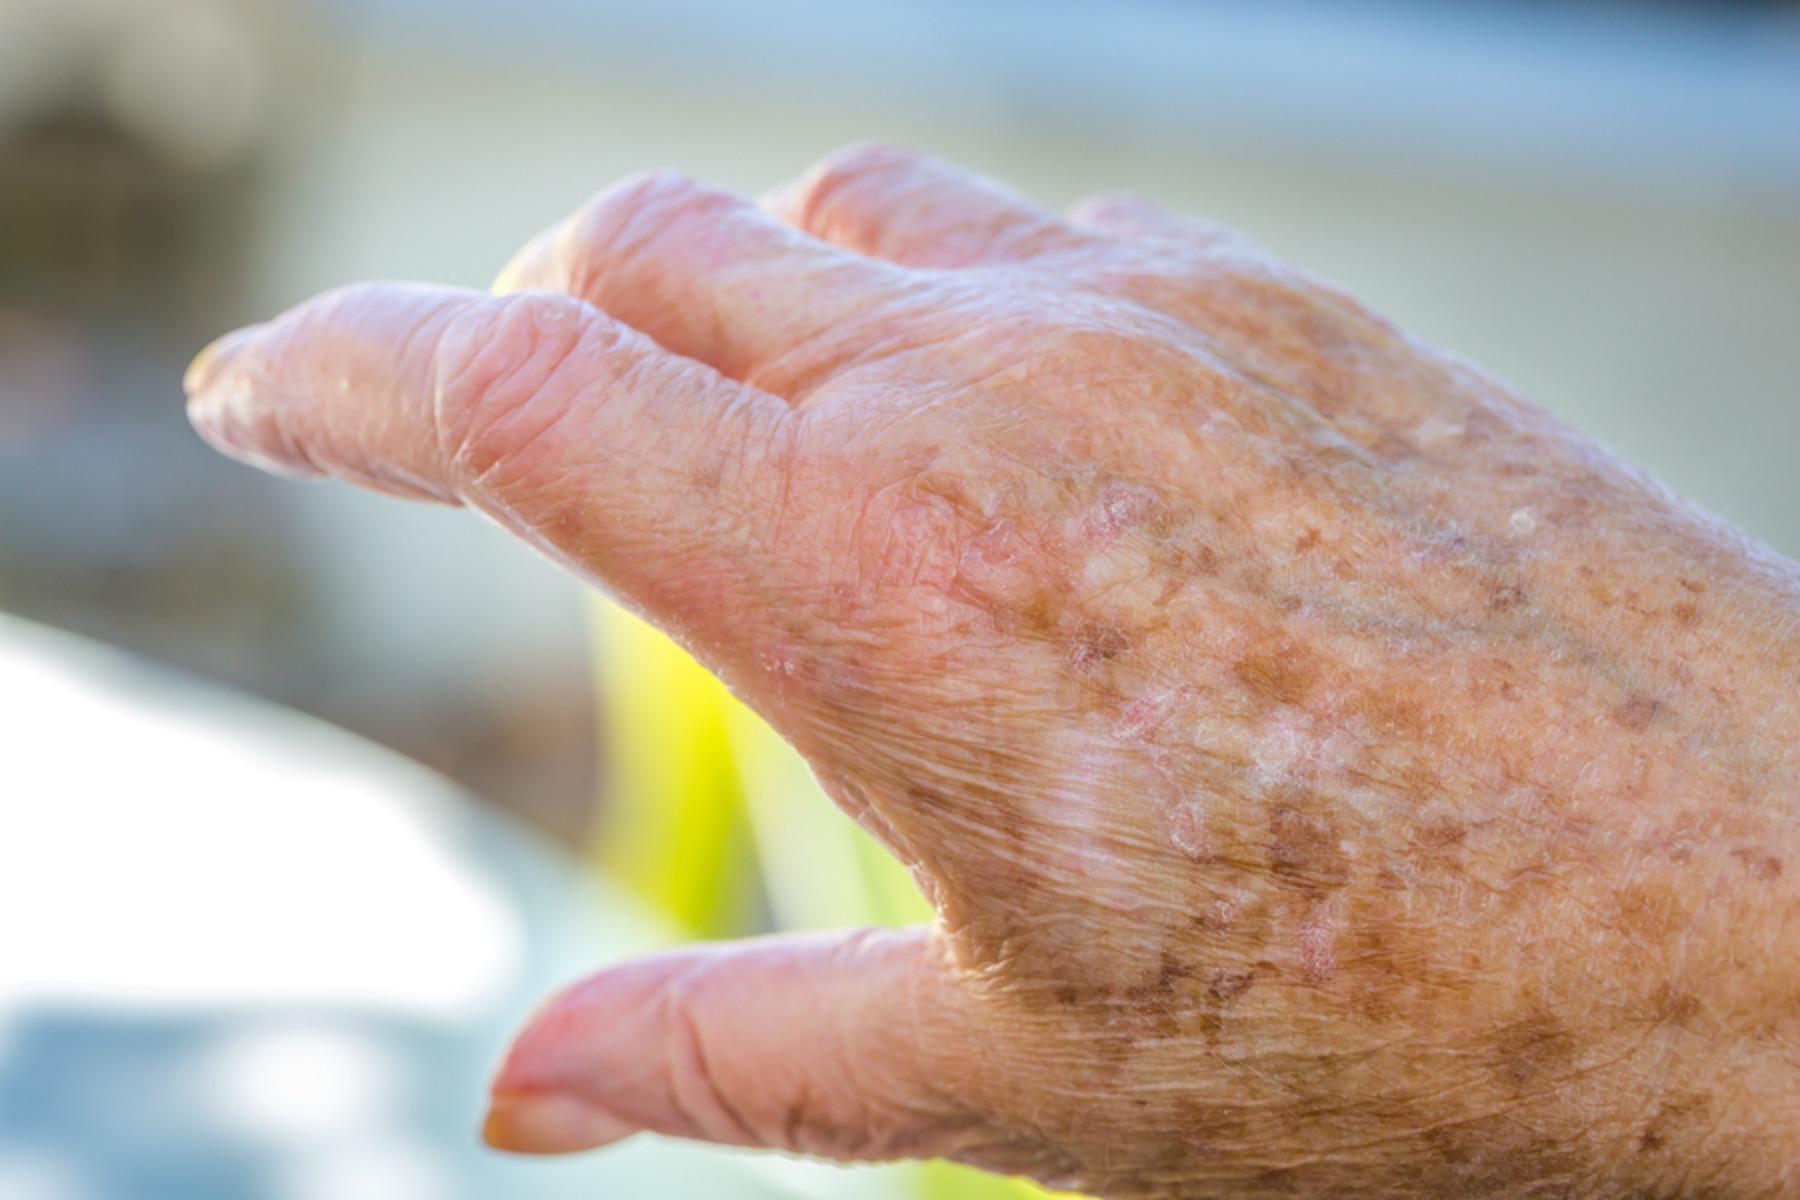 Elderly Care in Fair Lawn NJ: Senior Skin Care Tips